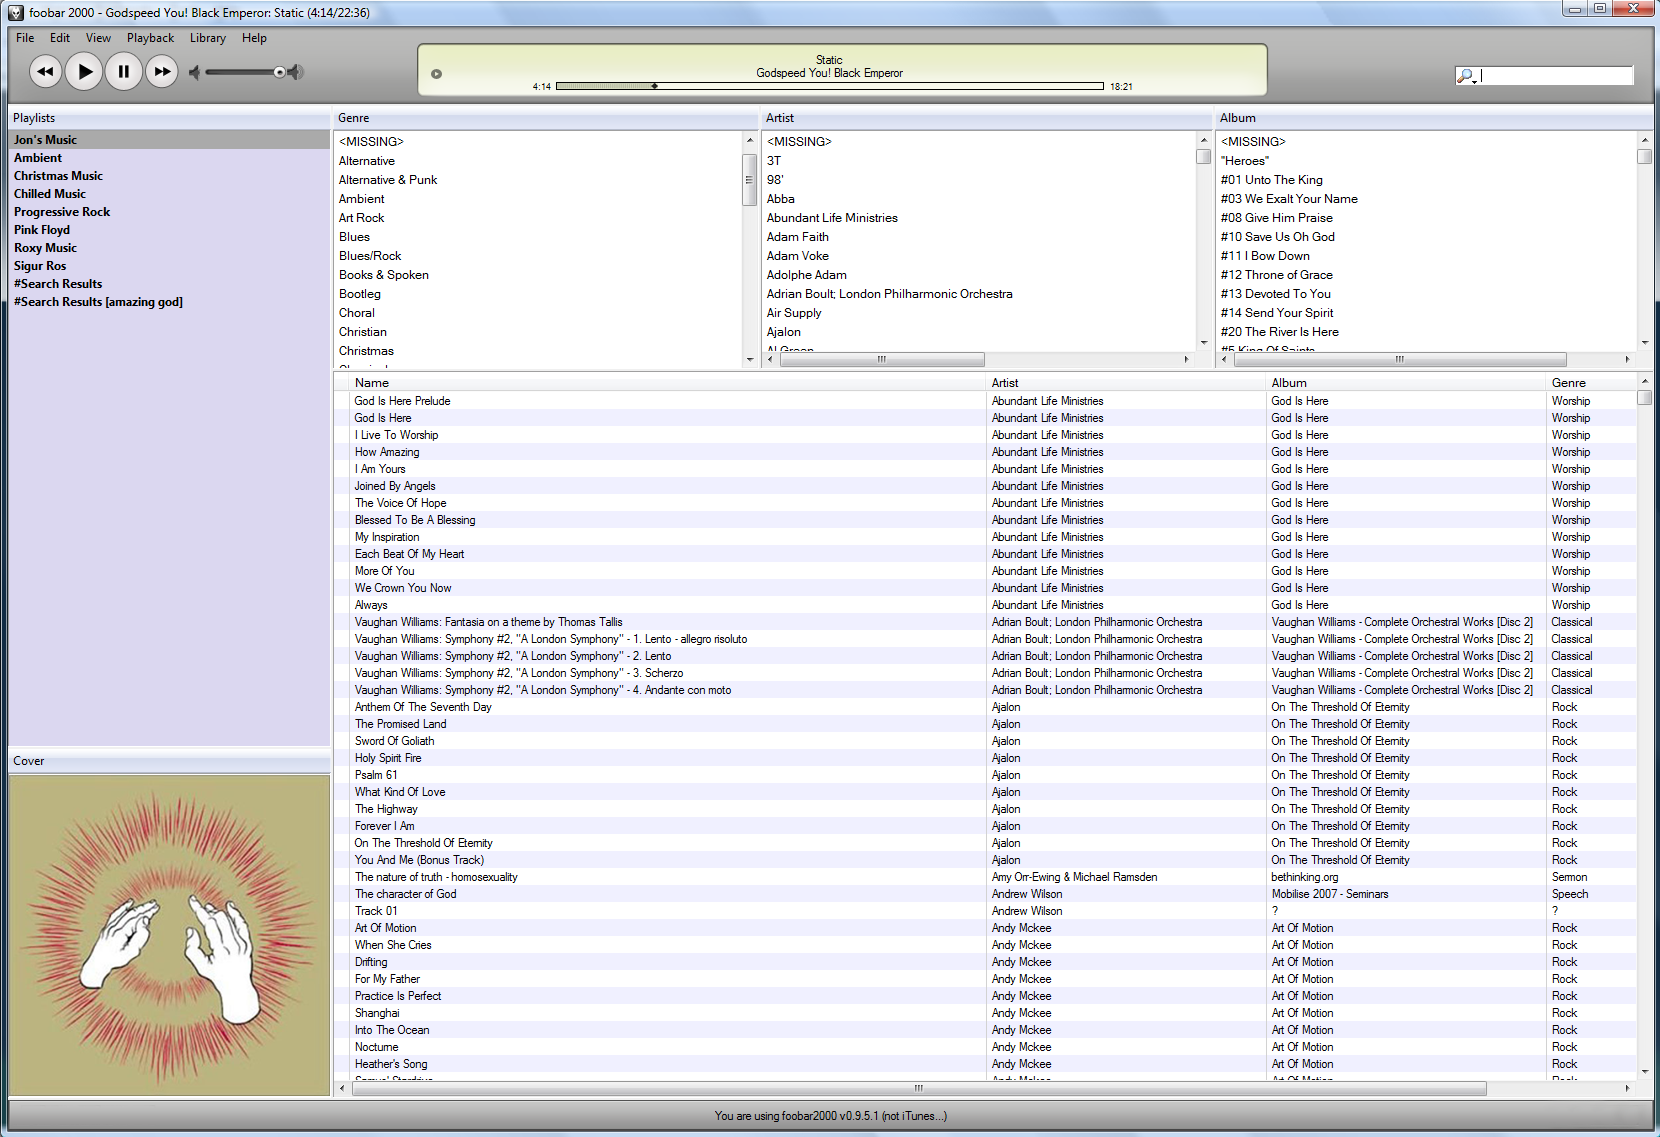 foobar2000: 5 2 Creating a ColumnsUI layout